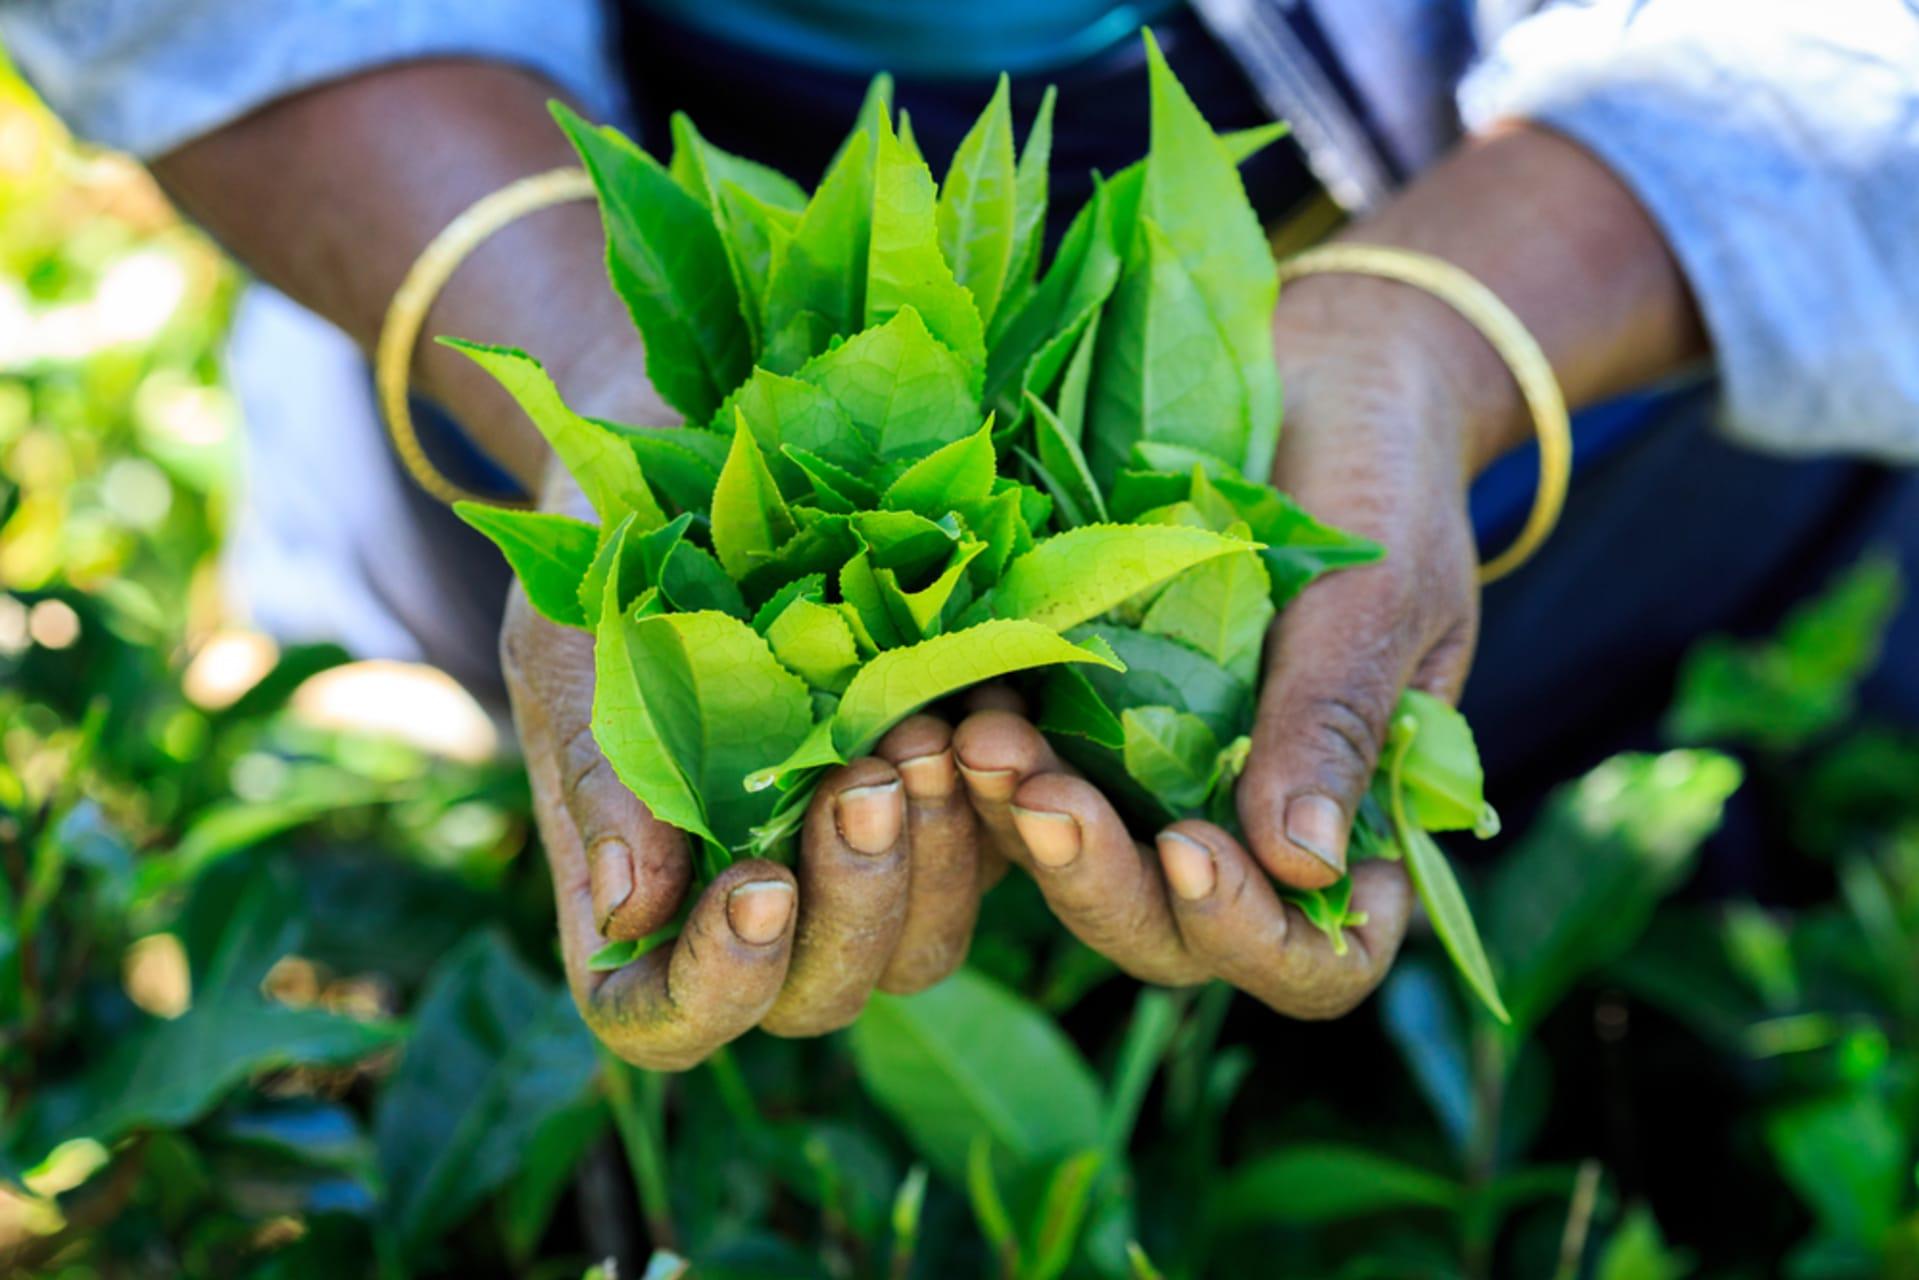 Kandy - Let's Learn Ceylon Tea Manufacturing... (Sri Lanka)